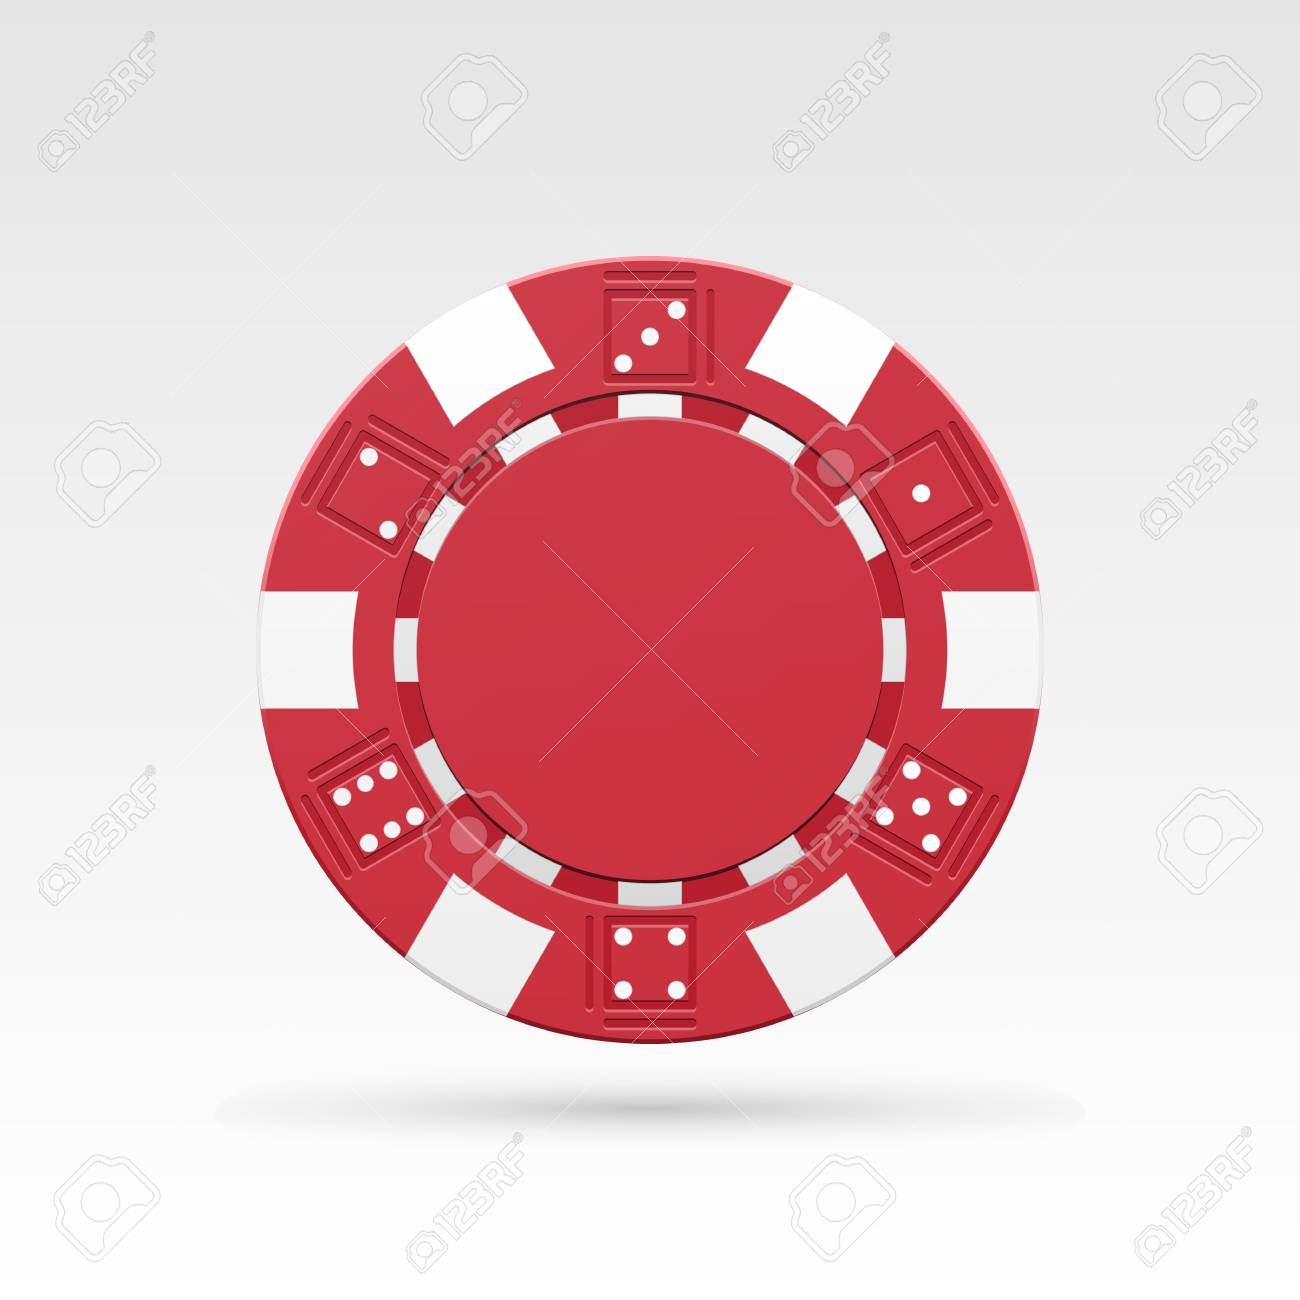 red casino chip